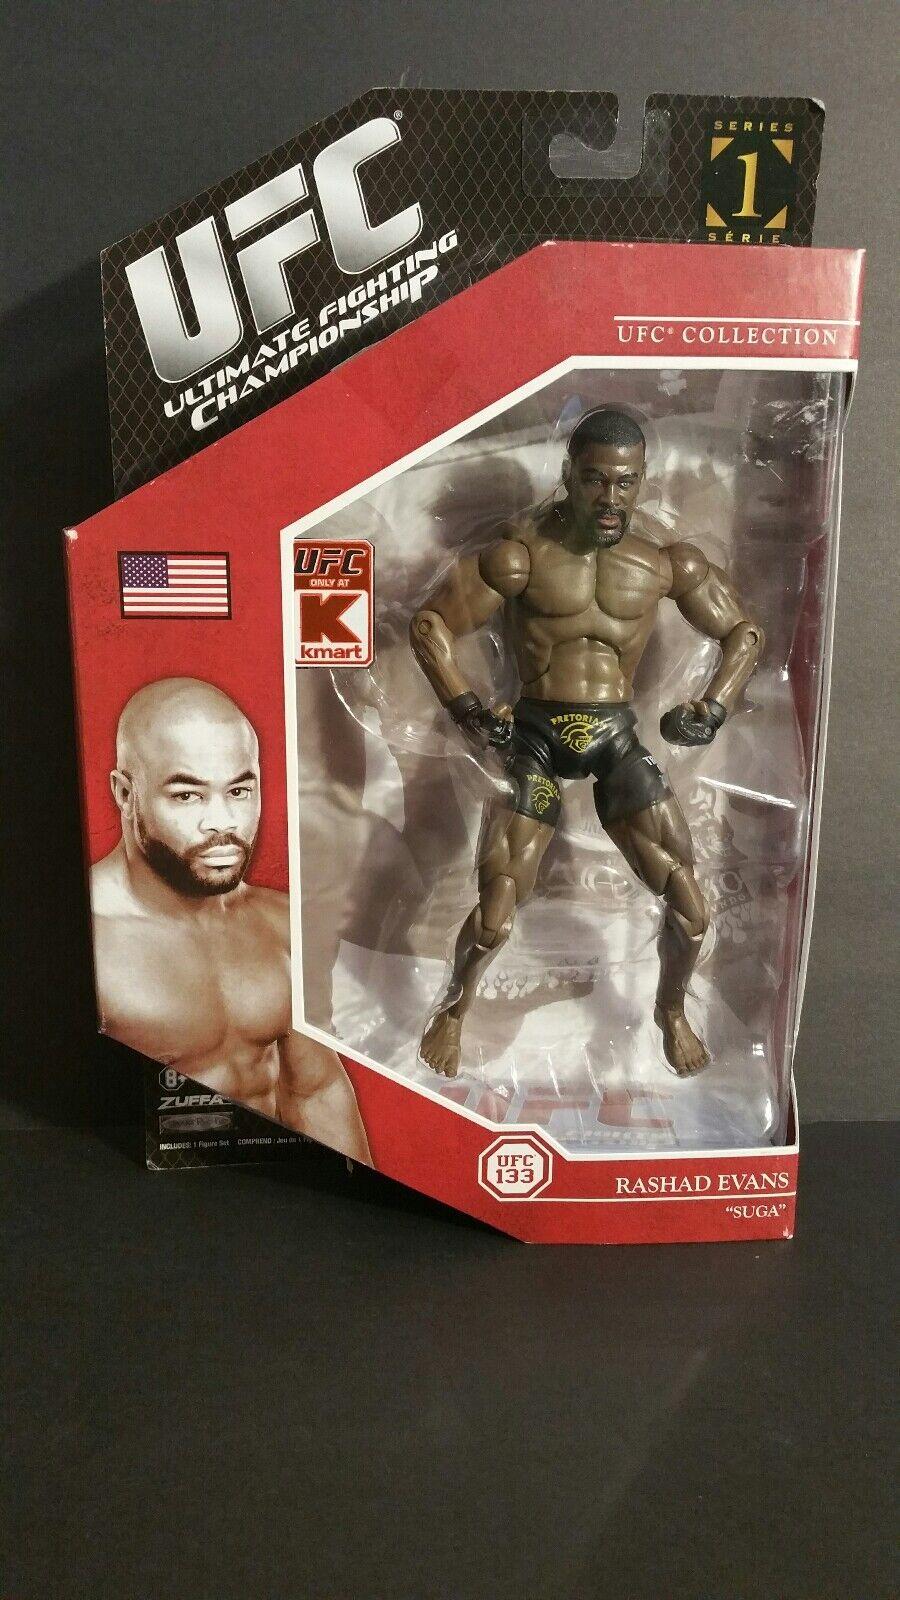 UFC 133 Rashad Evans  SUGAR  ACTION FIGURE (099)